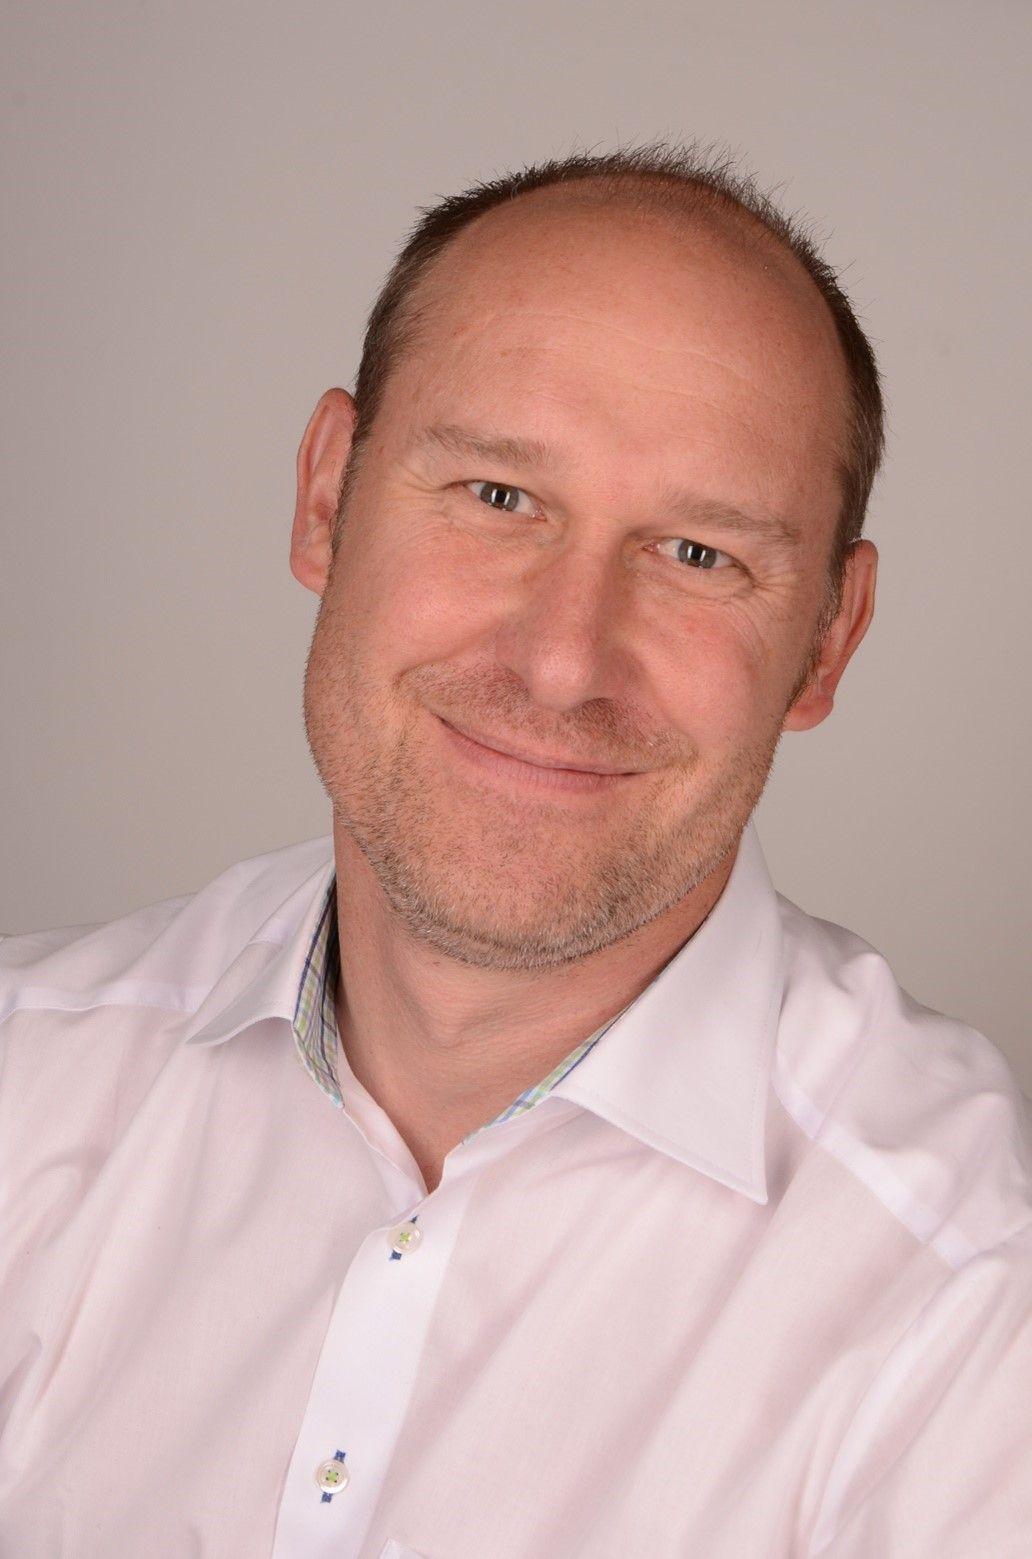 Michael Kemeny